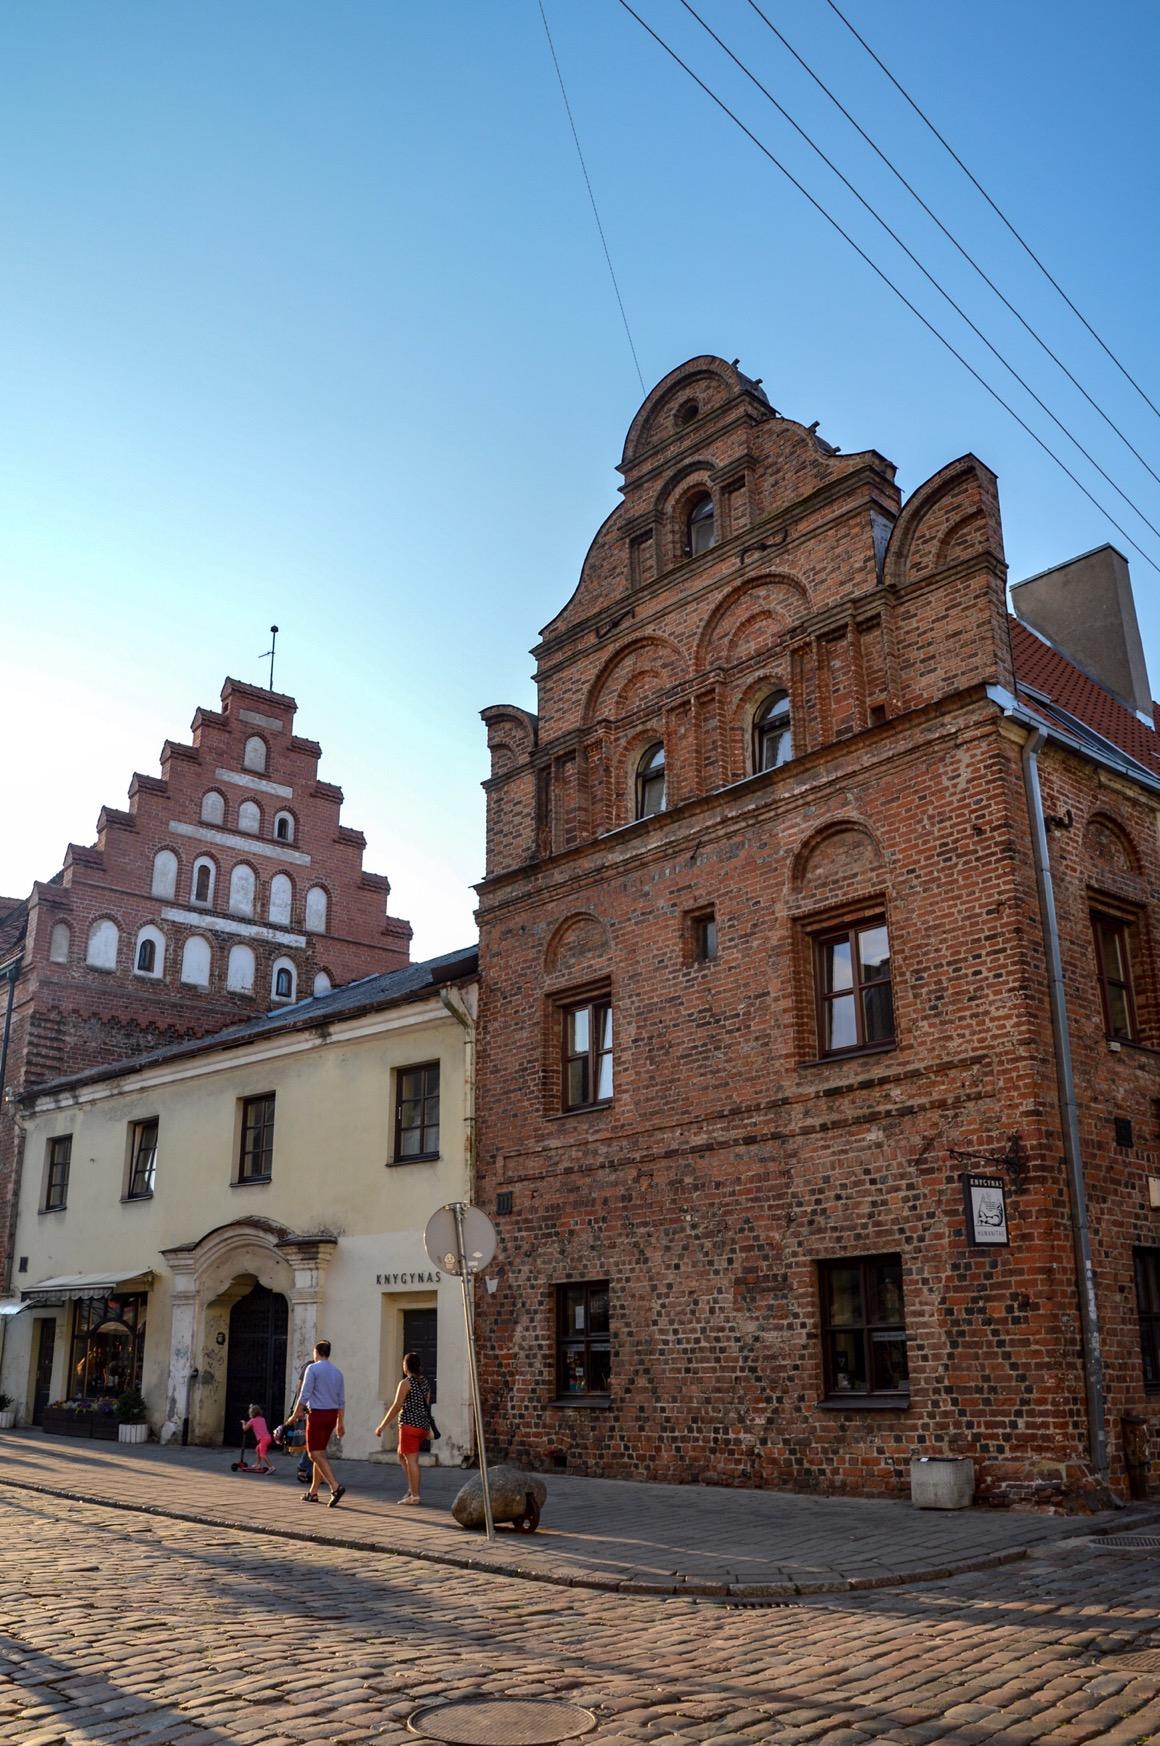 Kaunas Old Town, Lithuania